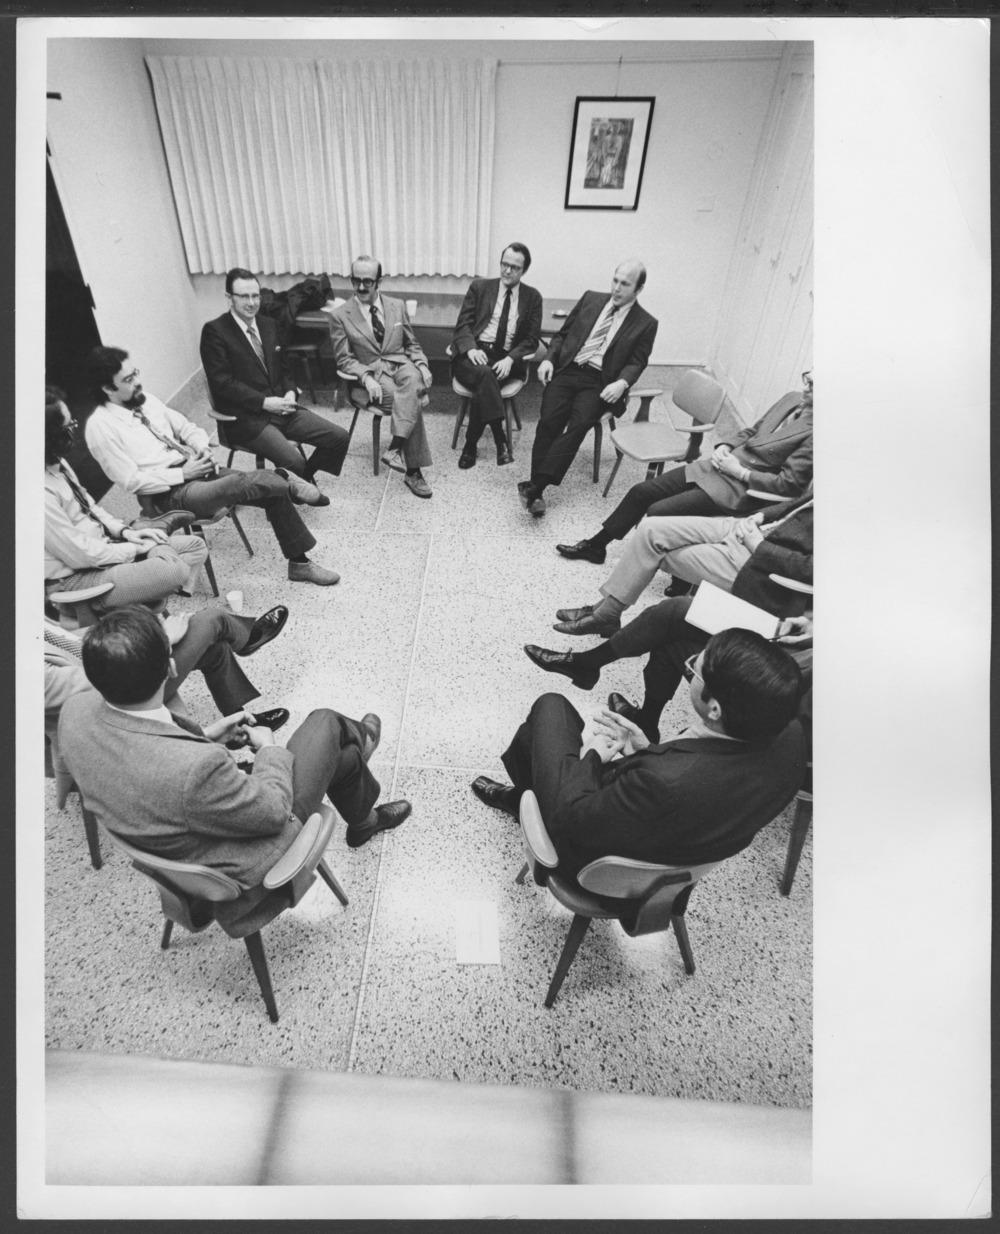 Menninger Clinic treatment team, Topeka, Kansas